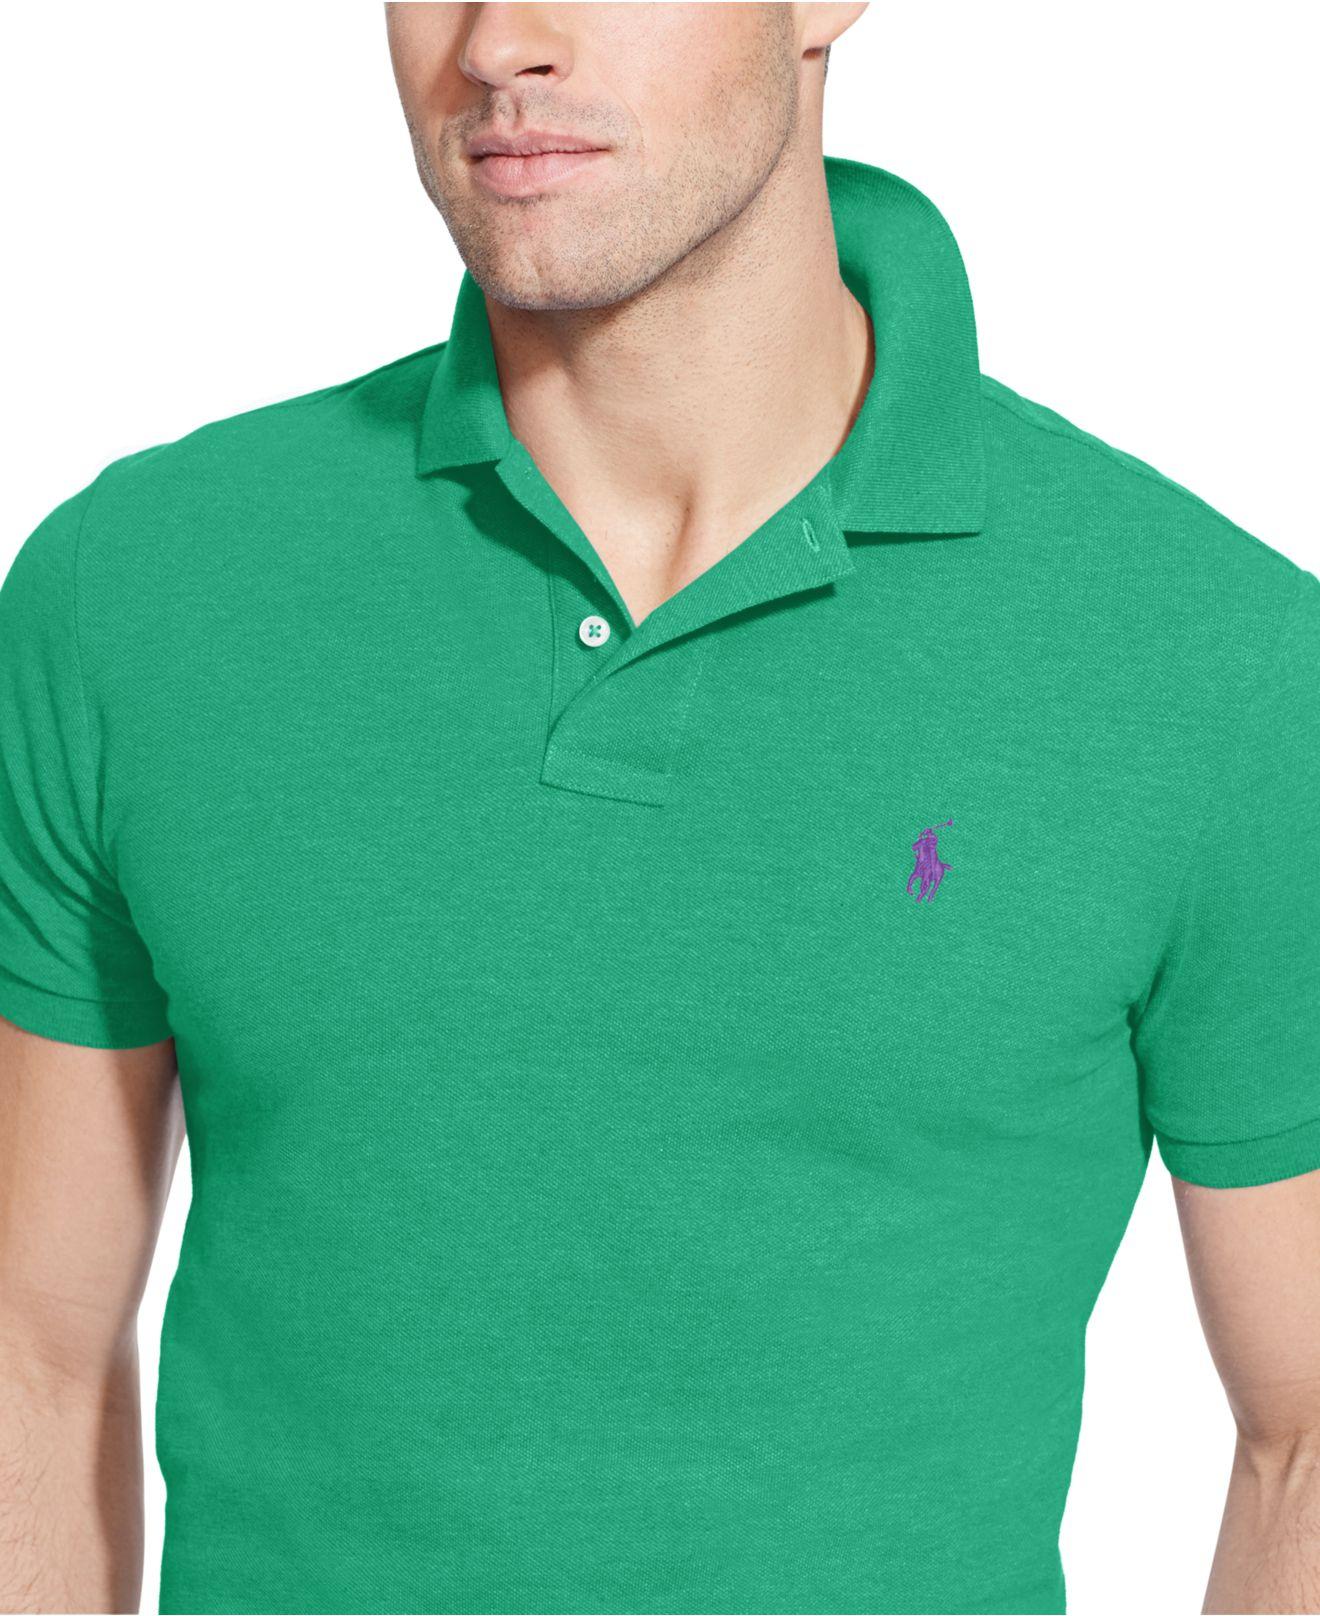 6b3cb9b7b Polo Ralph Lauren Custom-fit Mesh Polo Shirt in Green for Men - Lyst